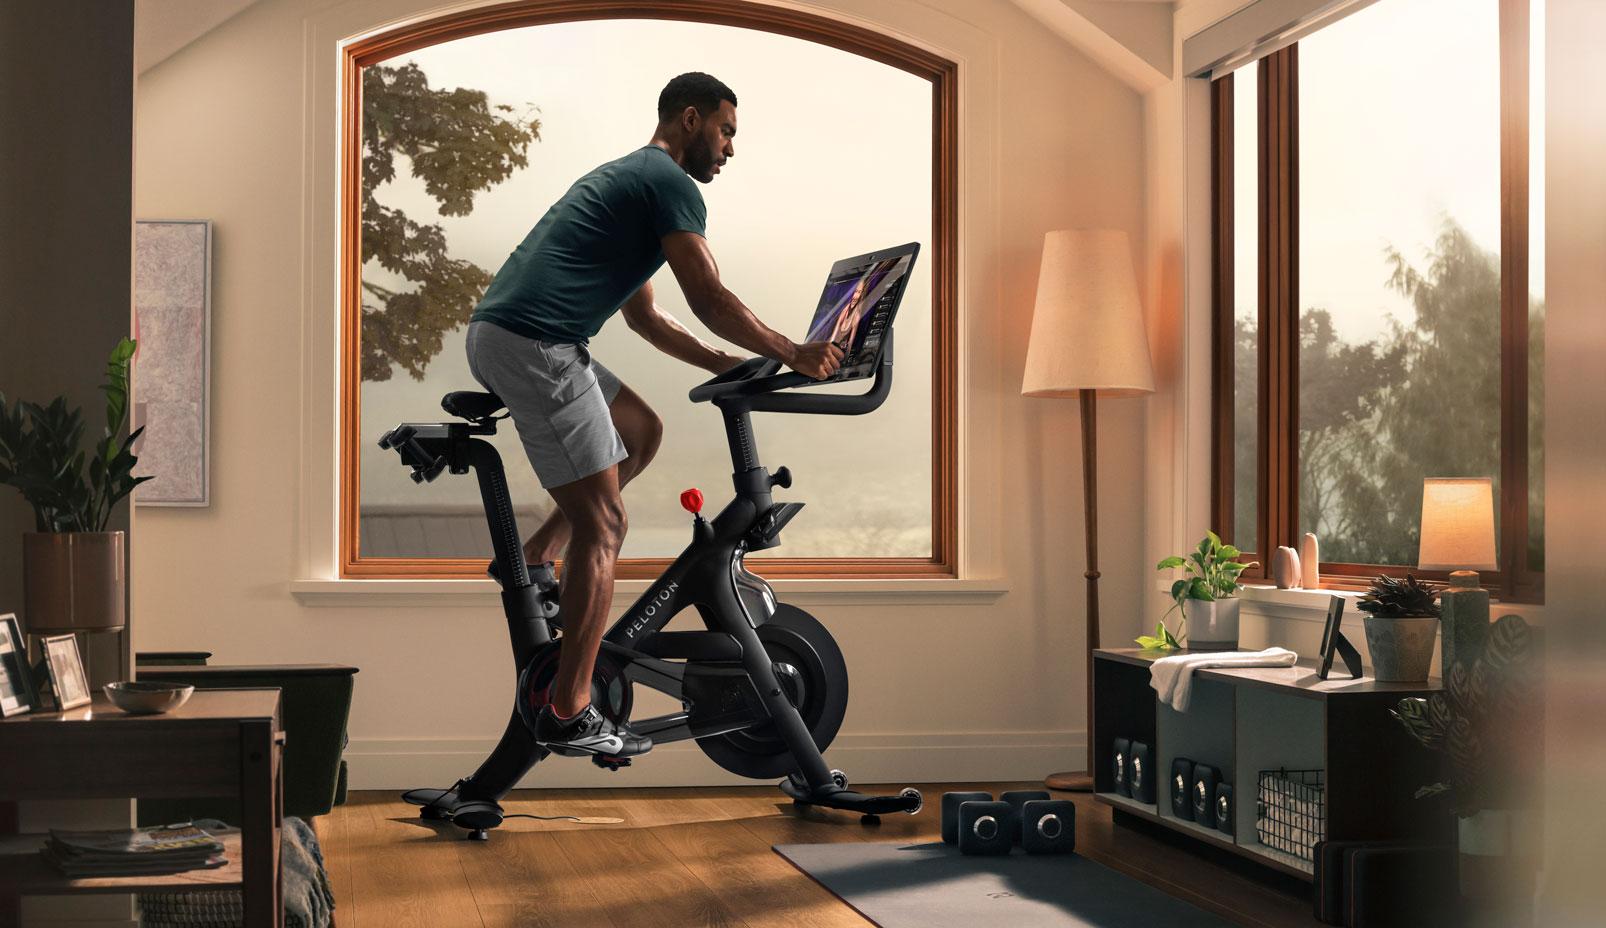 Person riding Peloton bike plus, living room